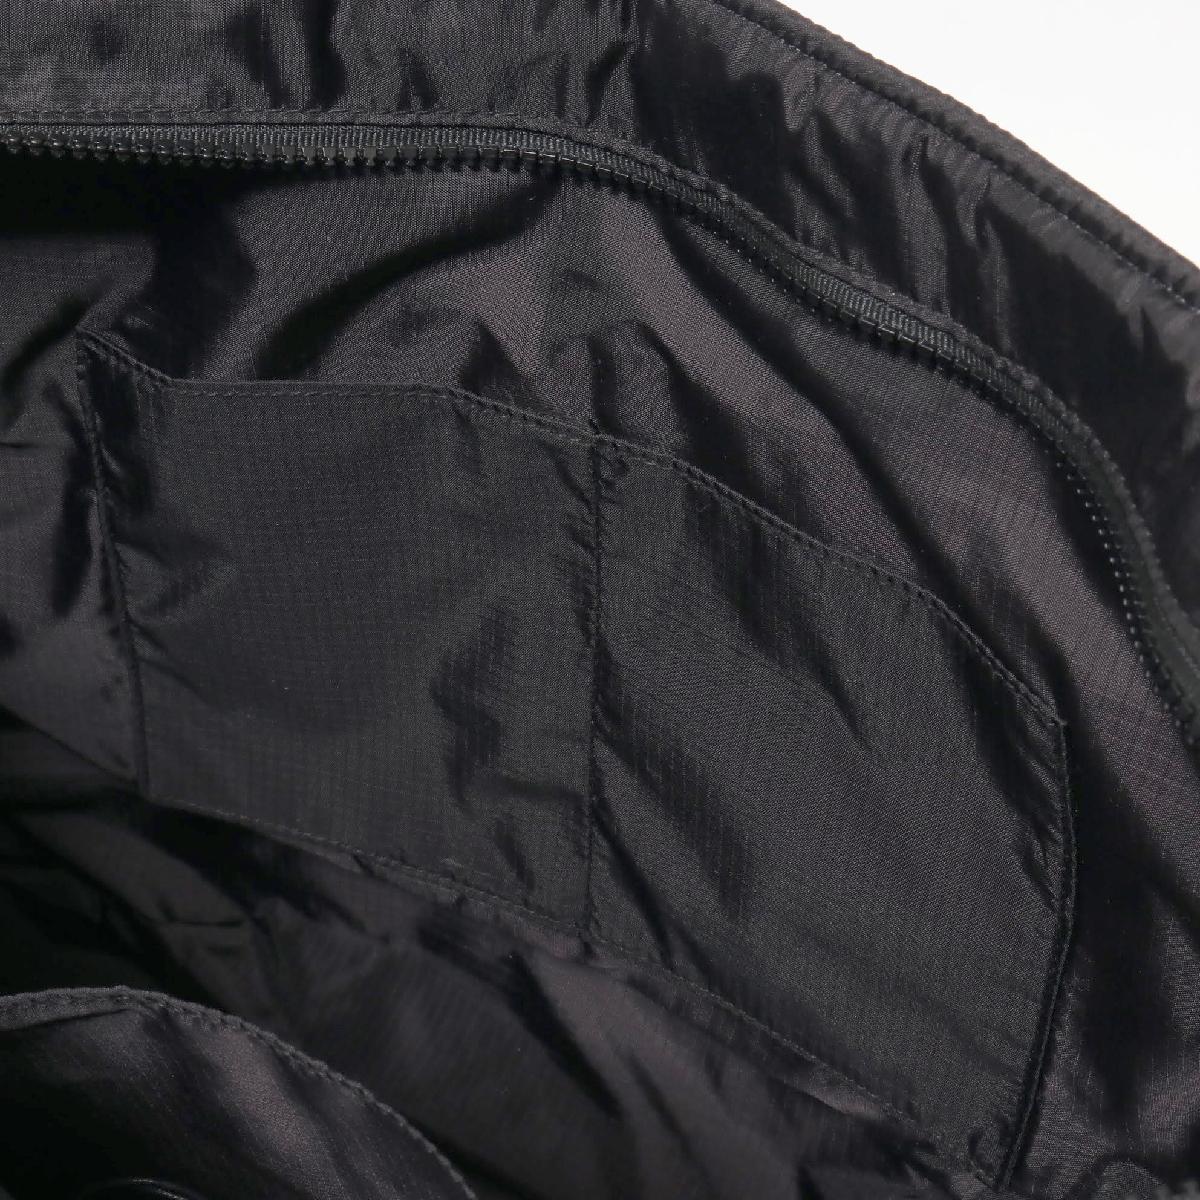 32066b93a16 UGG Krystal Puffer Tote (BLACK) (アグクリスタルパッファートート)